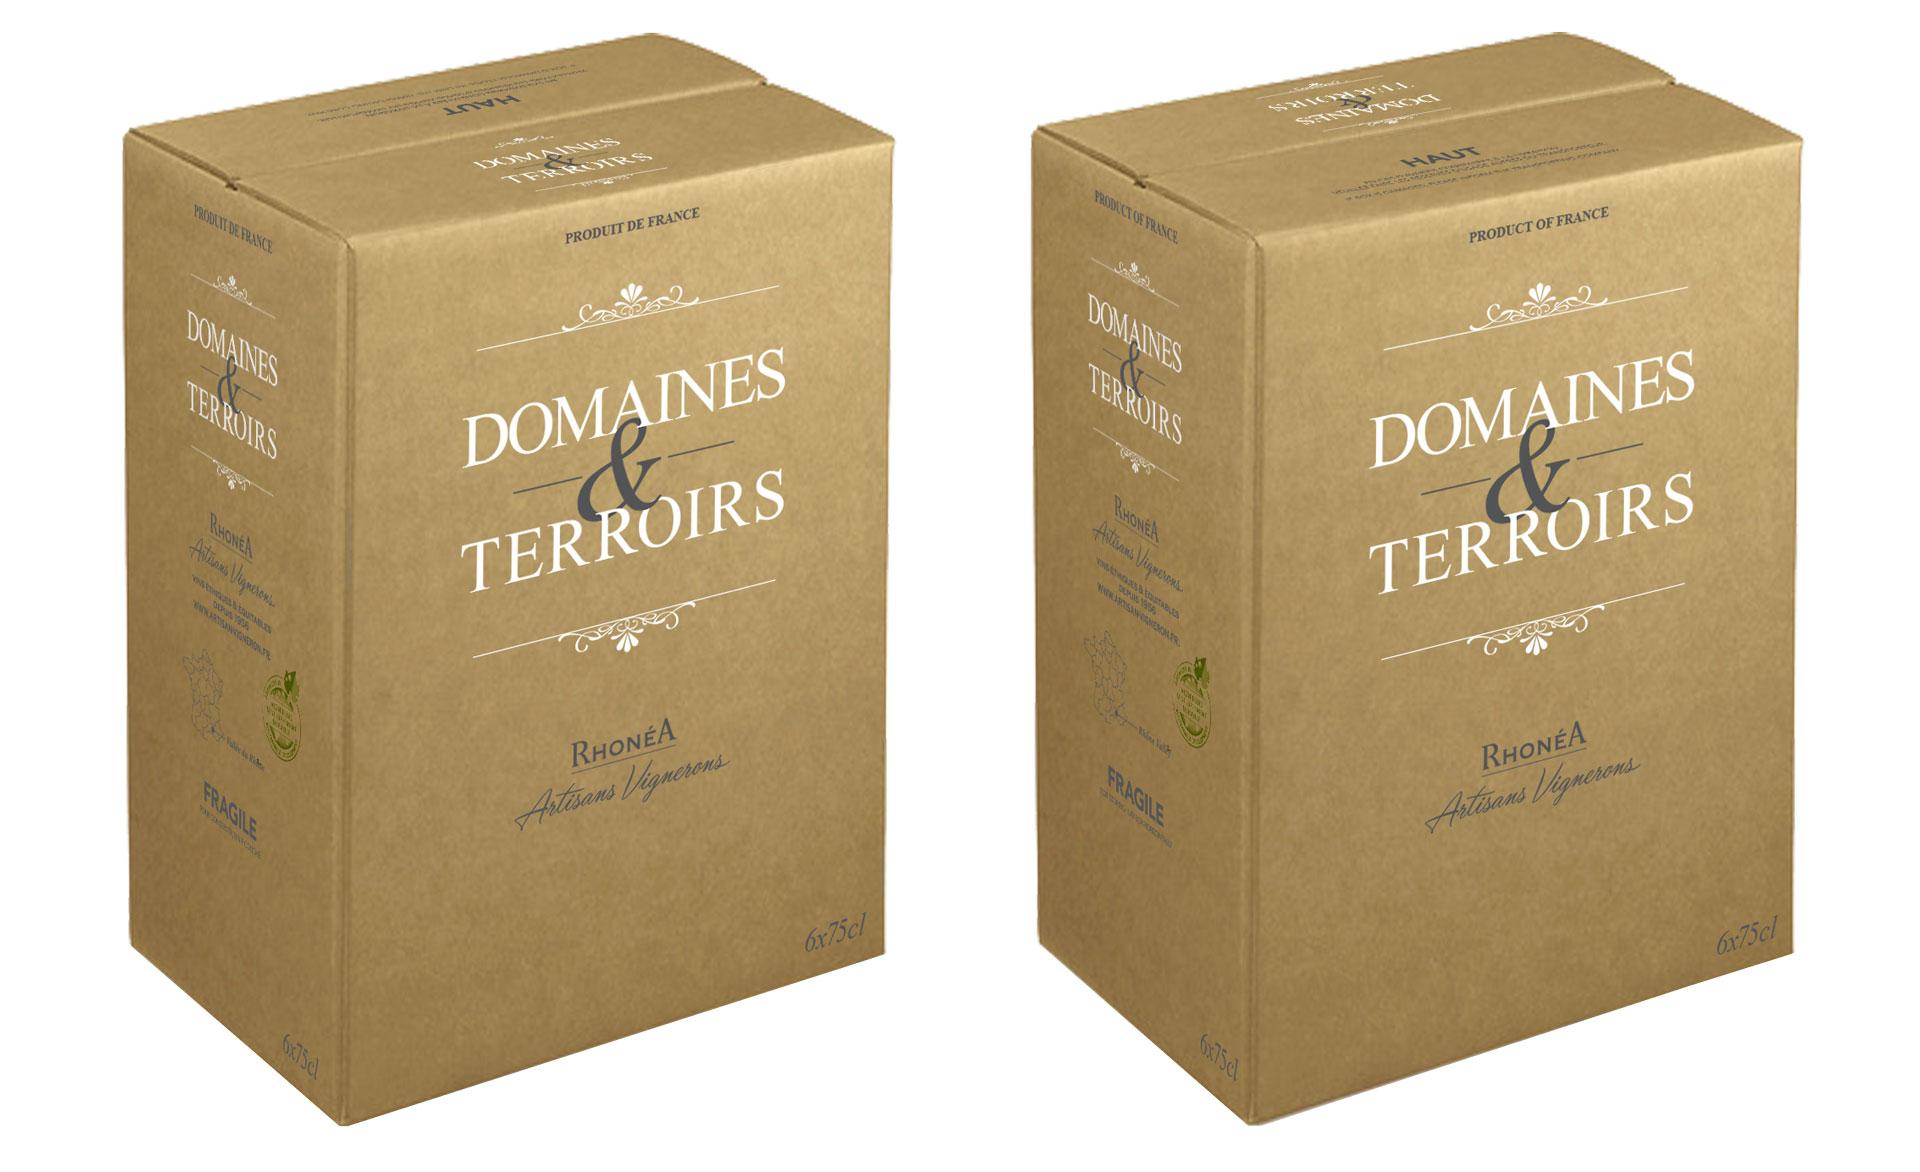 Carton Domaine & Terroirs